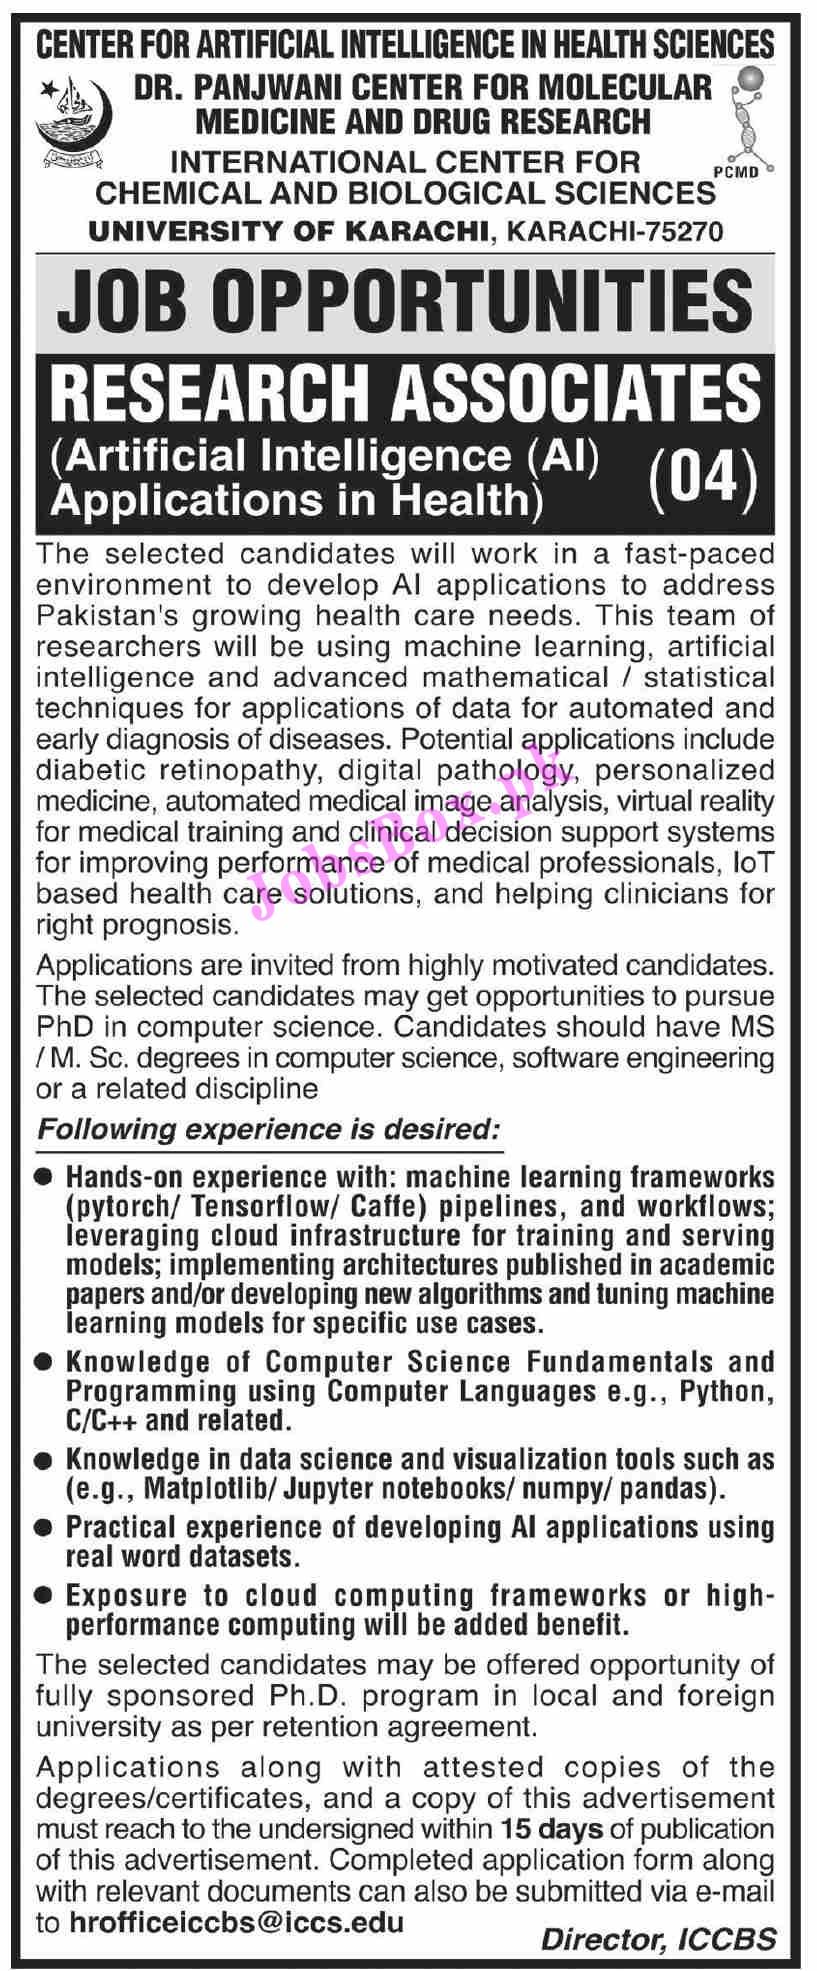 University of Karachi UOK Jobs 2021 All Advertisements